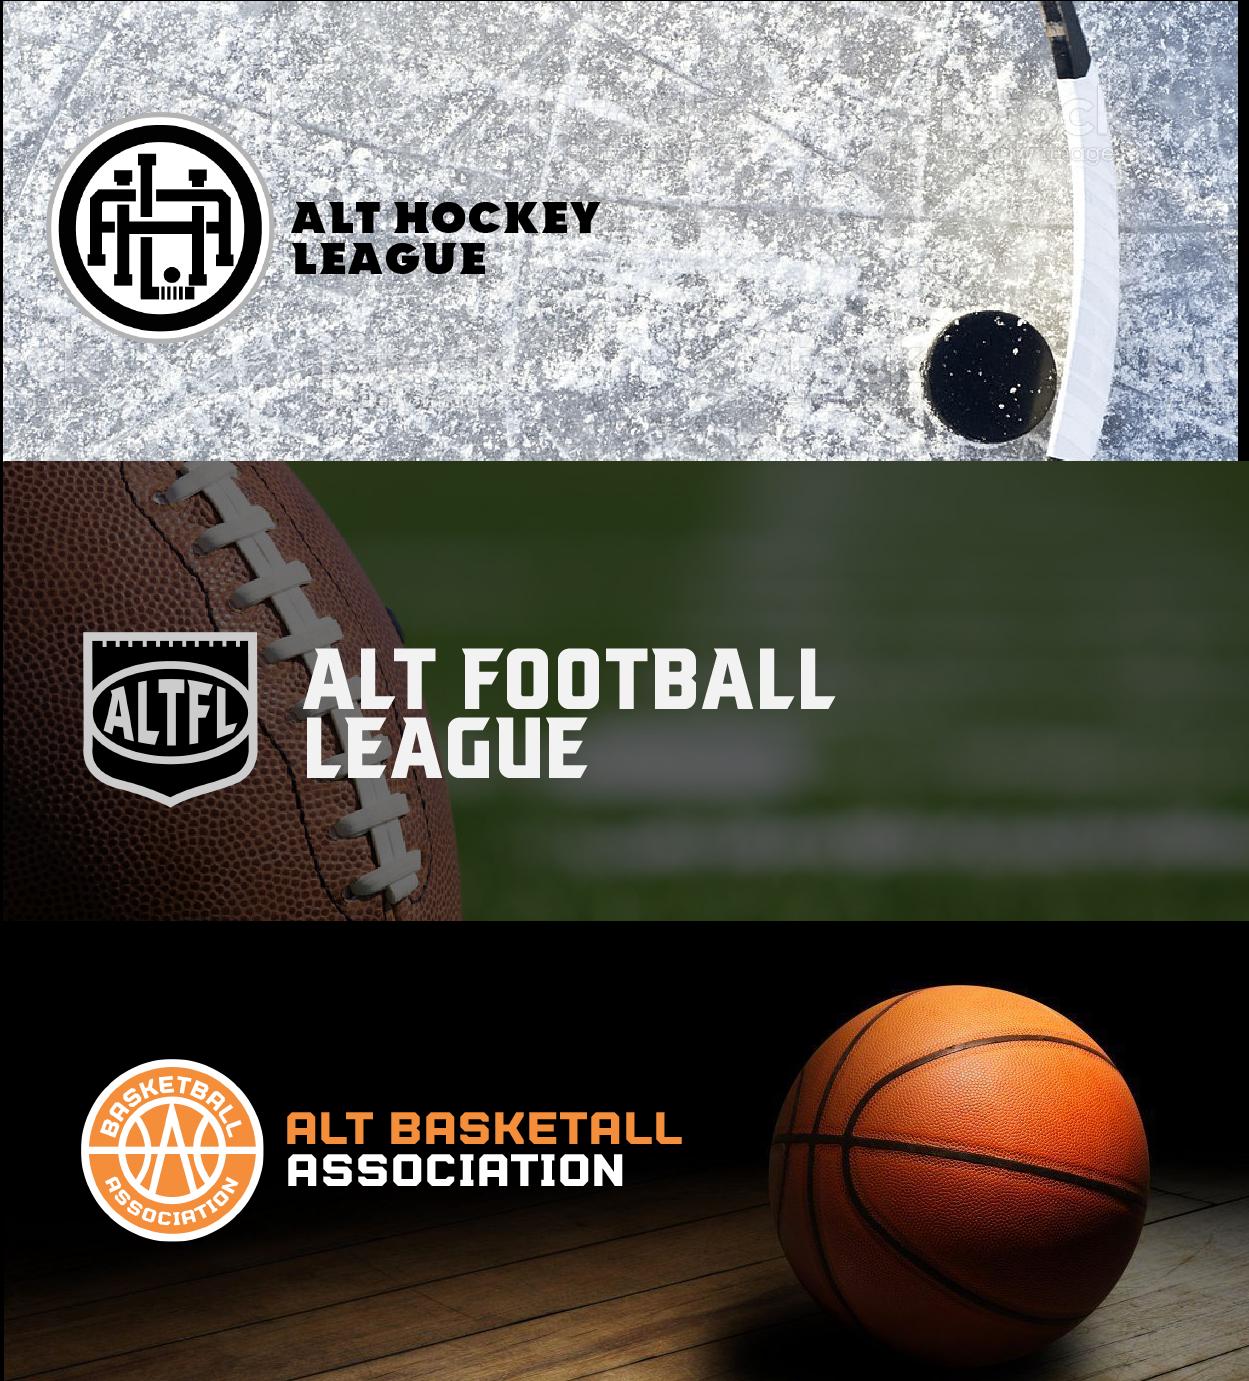 https://i.ibb.co/ZBwvz2L/Alt-Sports.png